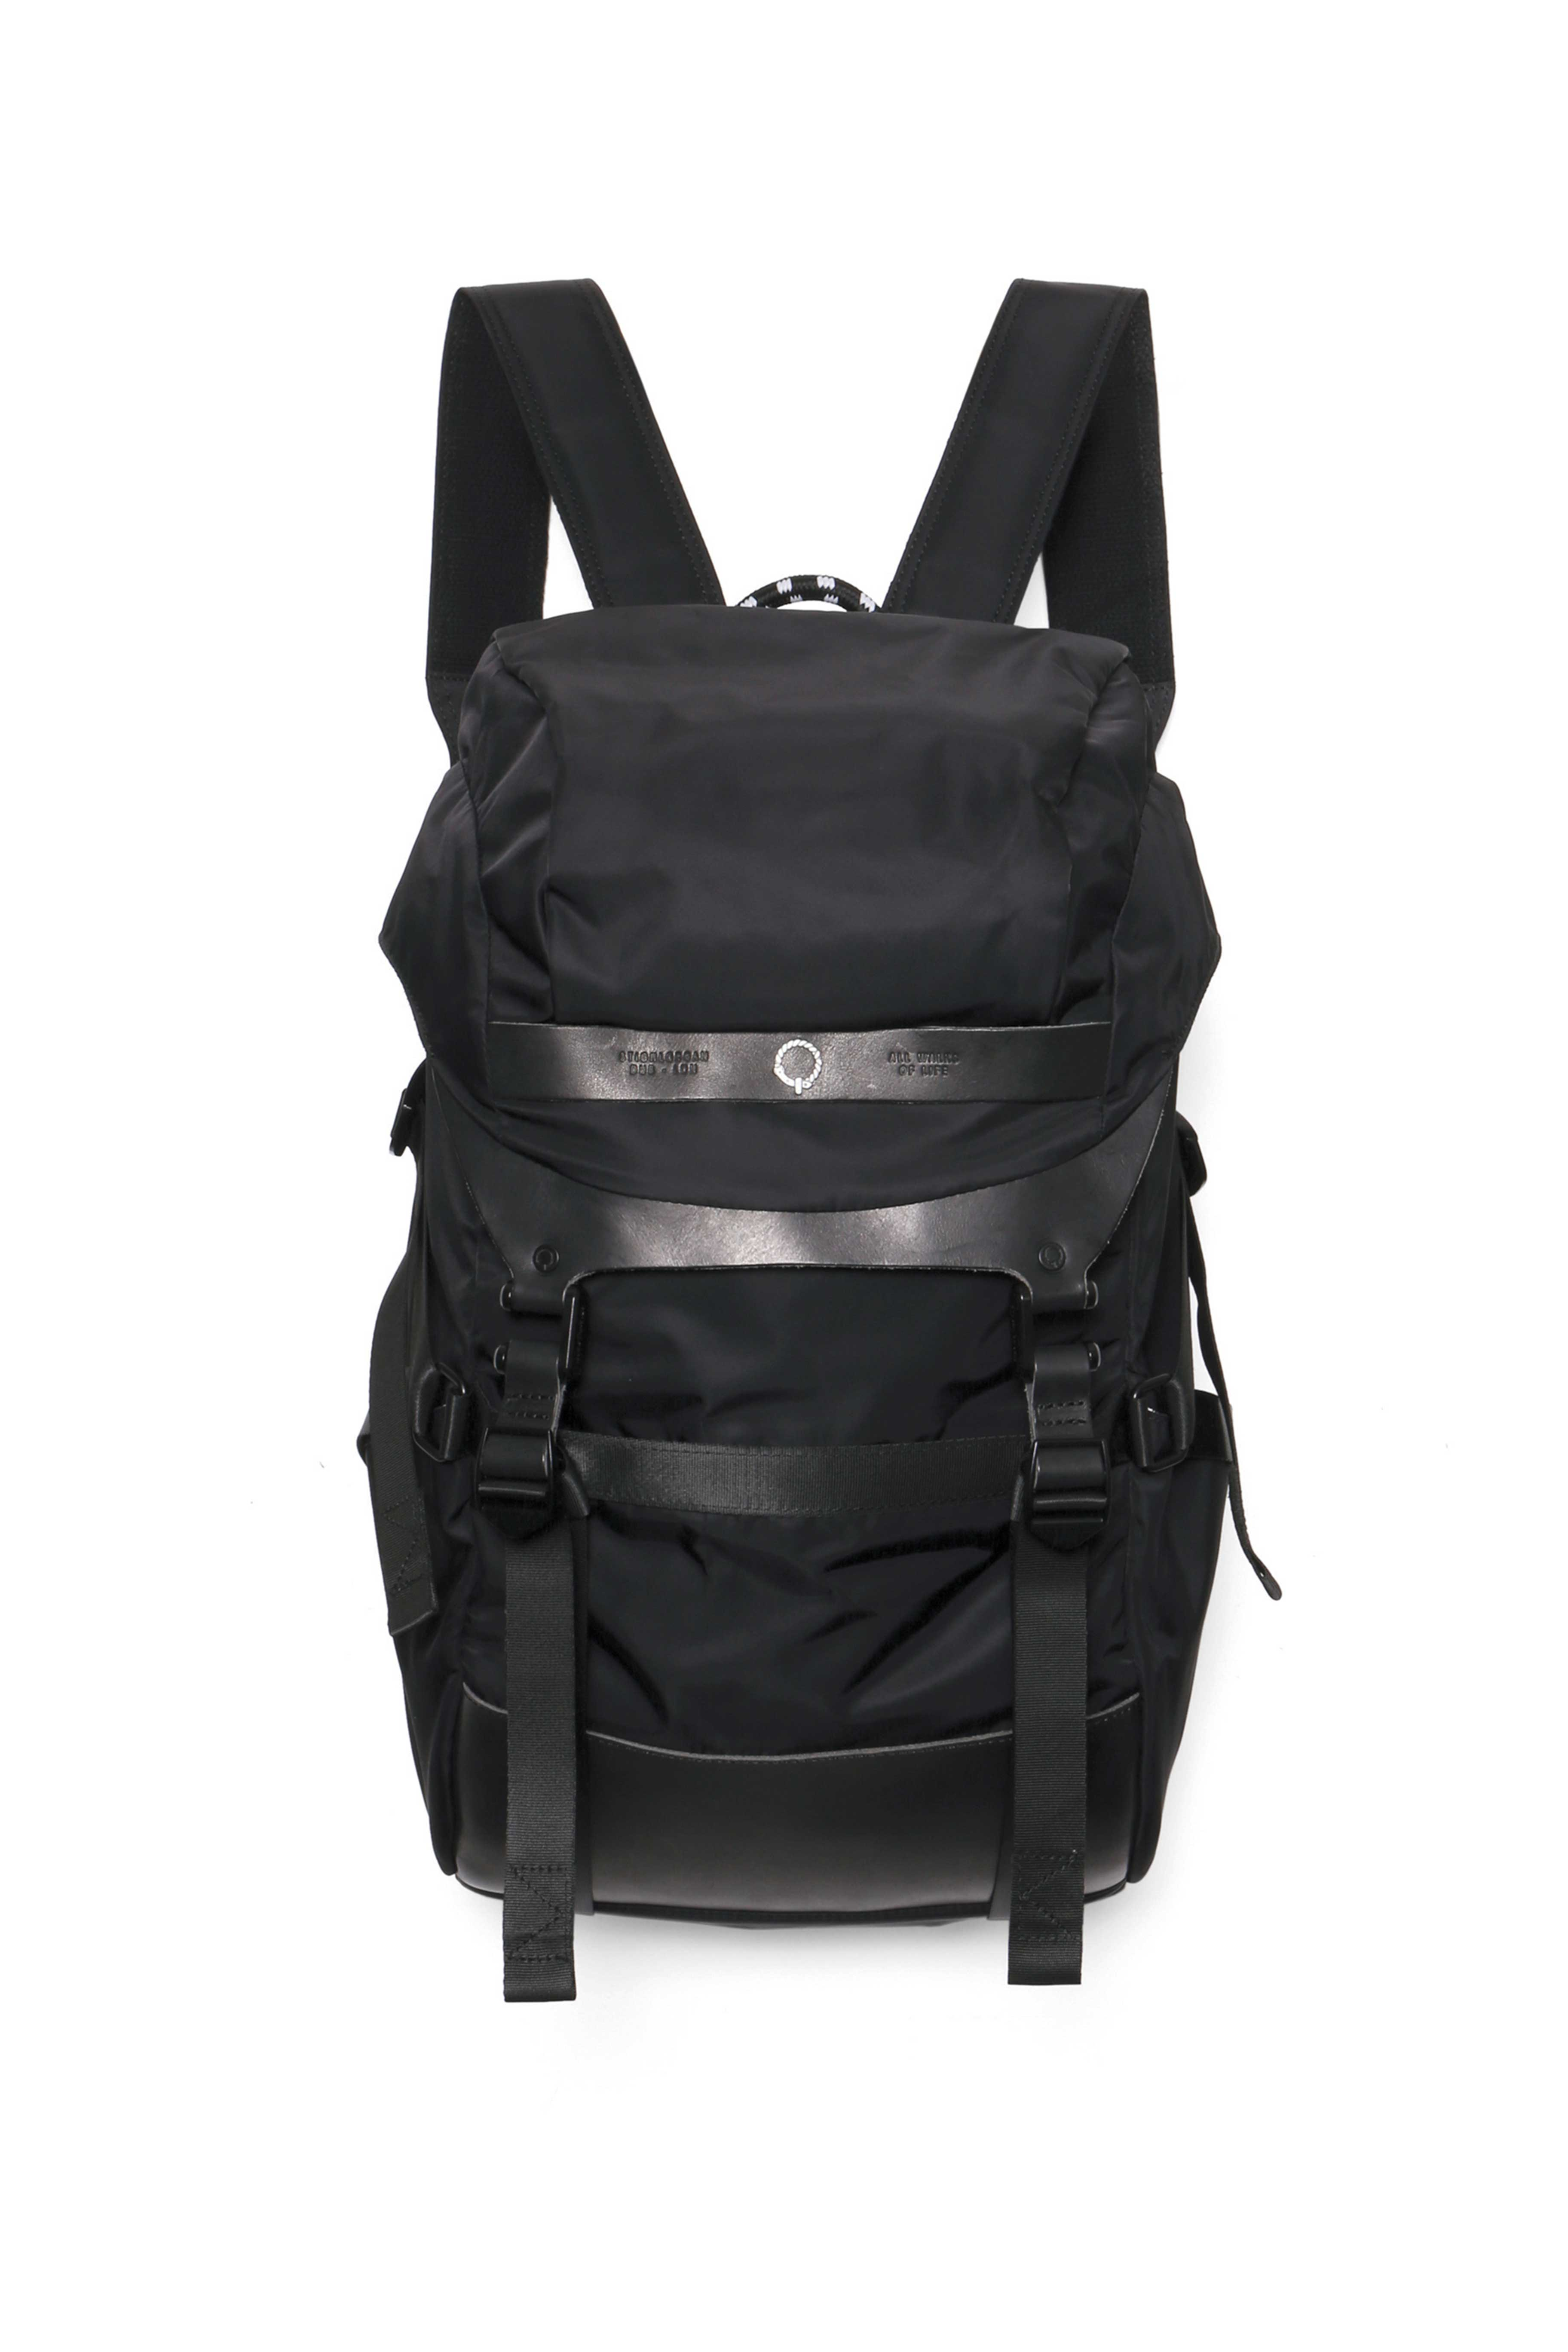 3958d4a84e Stighlorgan - Drawstring backpacks